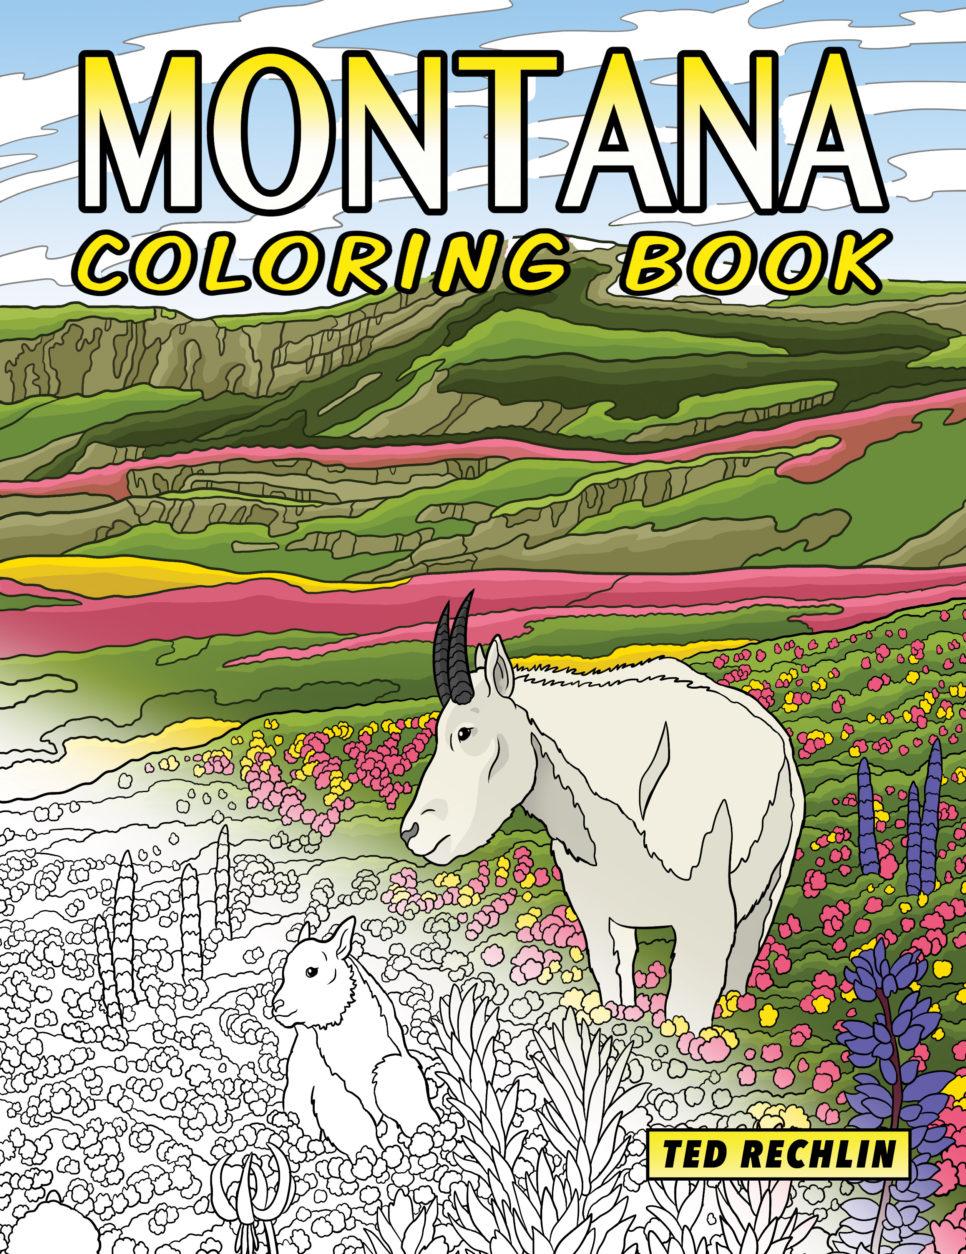 Montana Coloring Book Cover - Mountain Goats at Glacier National Park